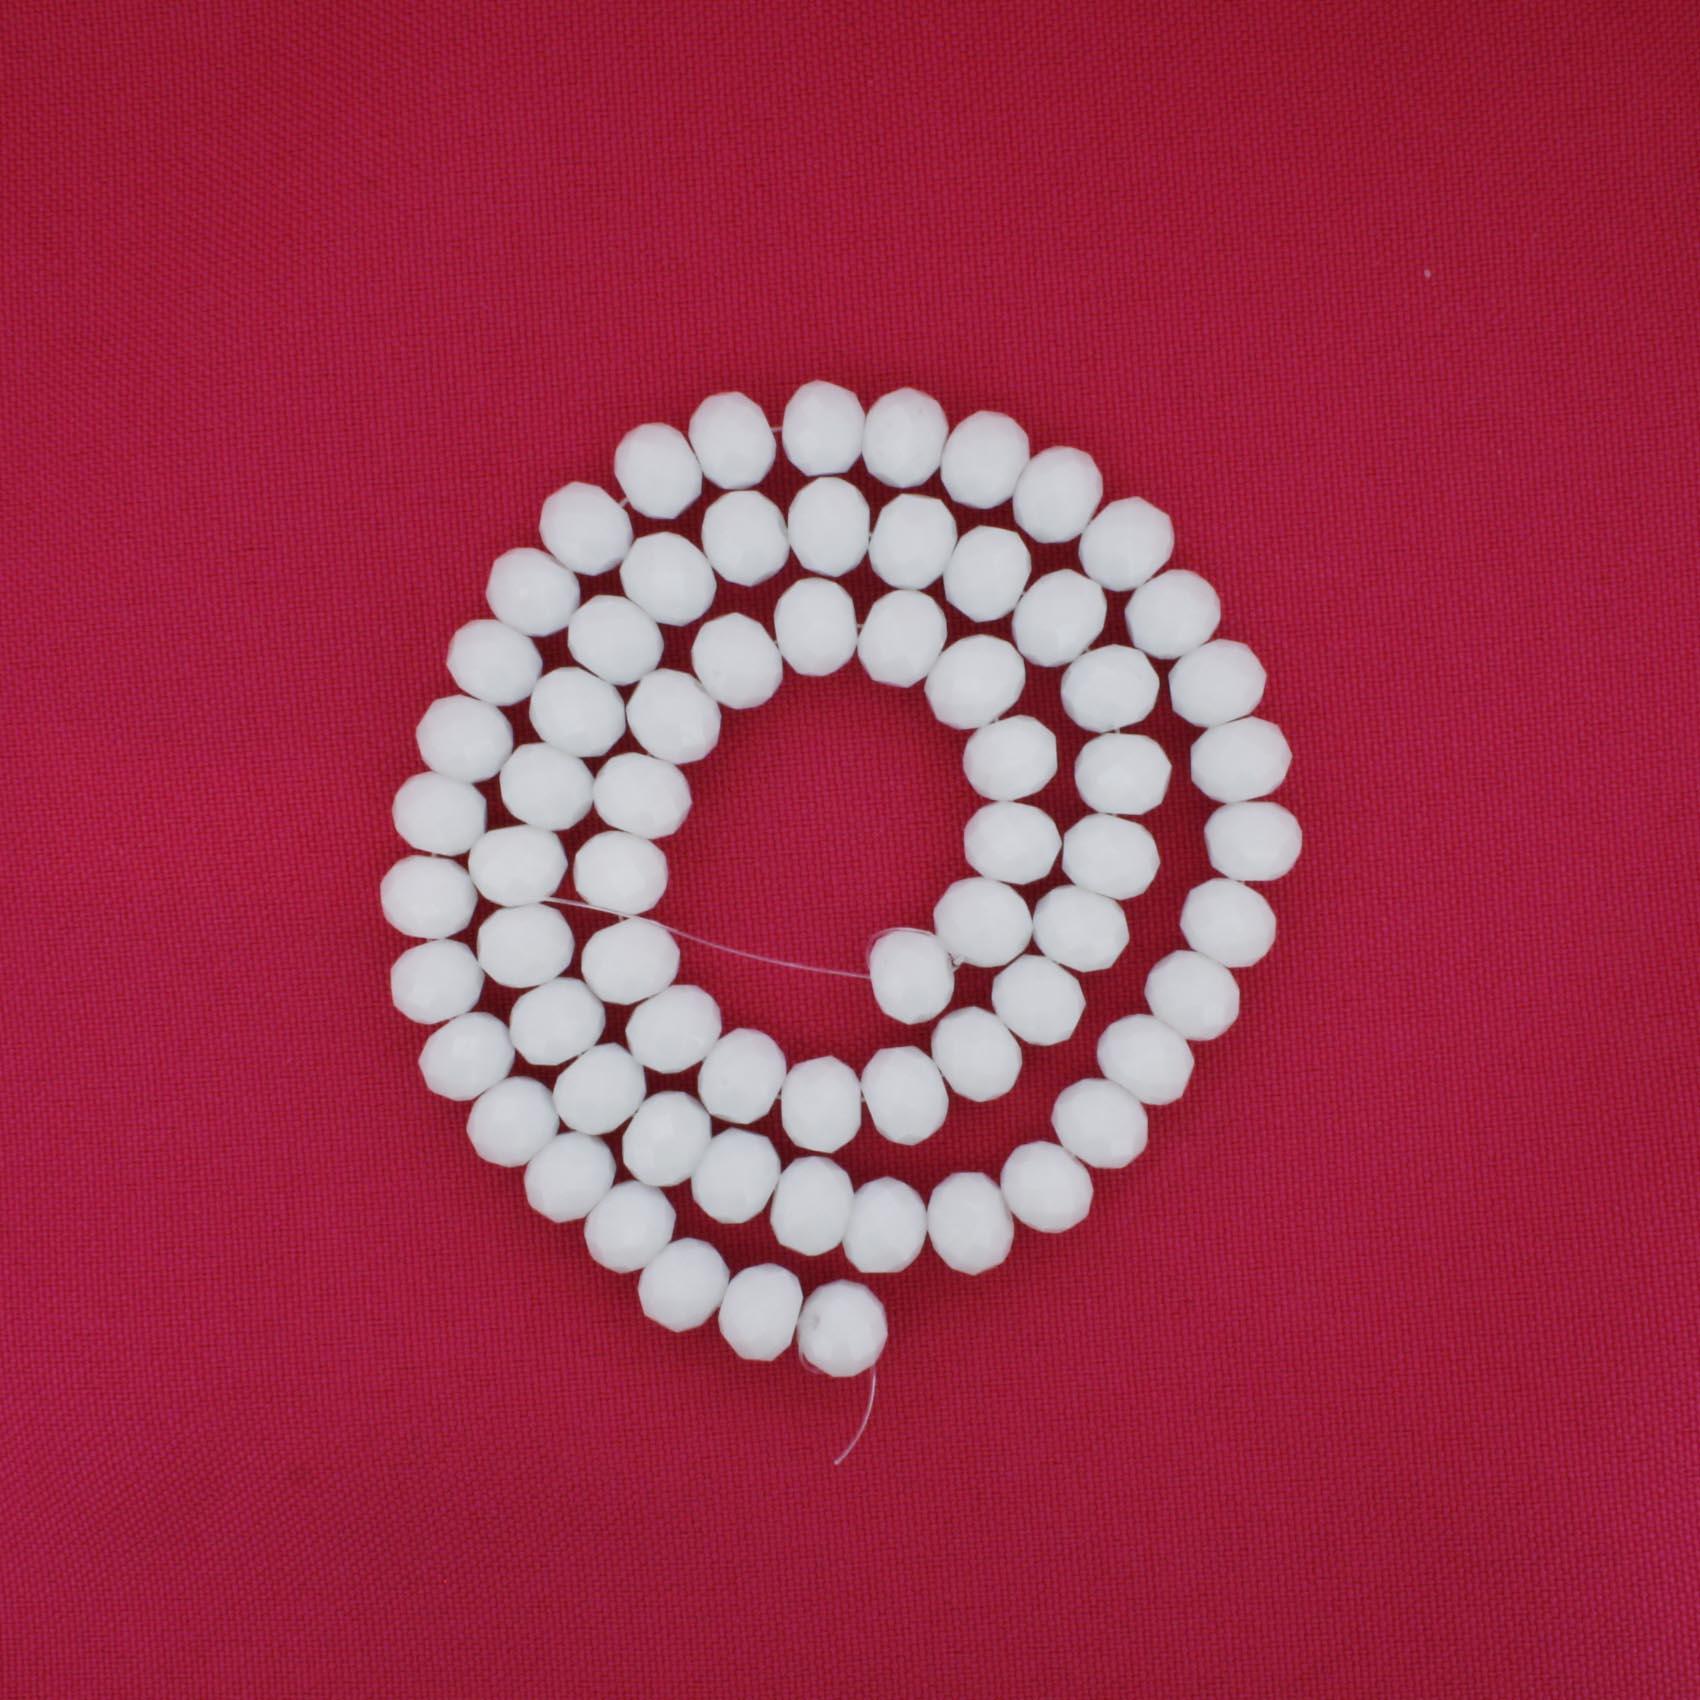 Fio de Cristal - Flat® - Branco - 8mm  - Stéphanie Bijoux® - Peças para Bijuterias e Artesanato